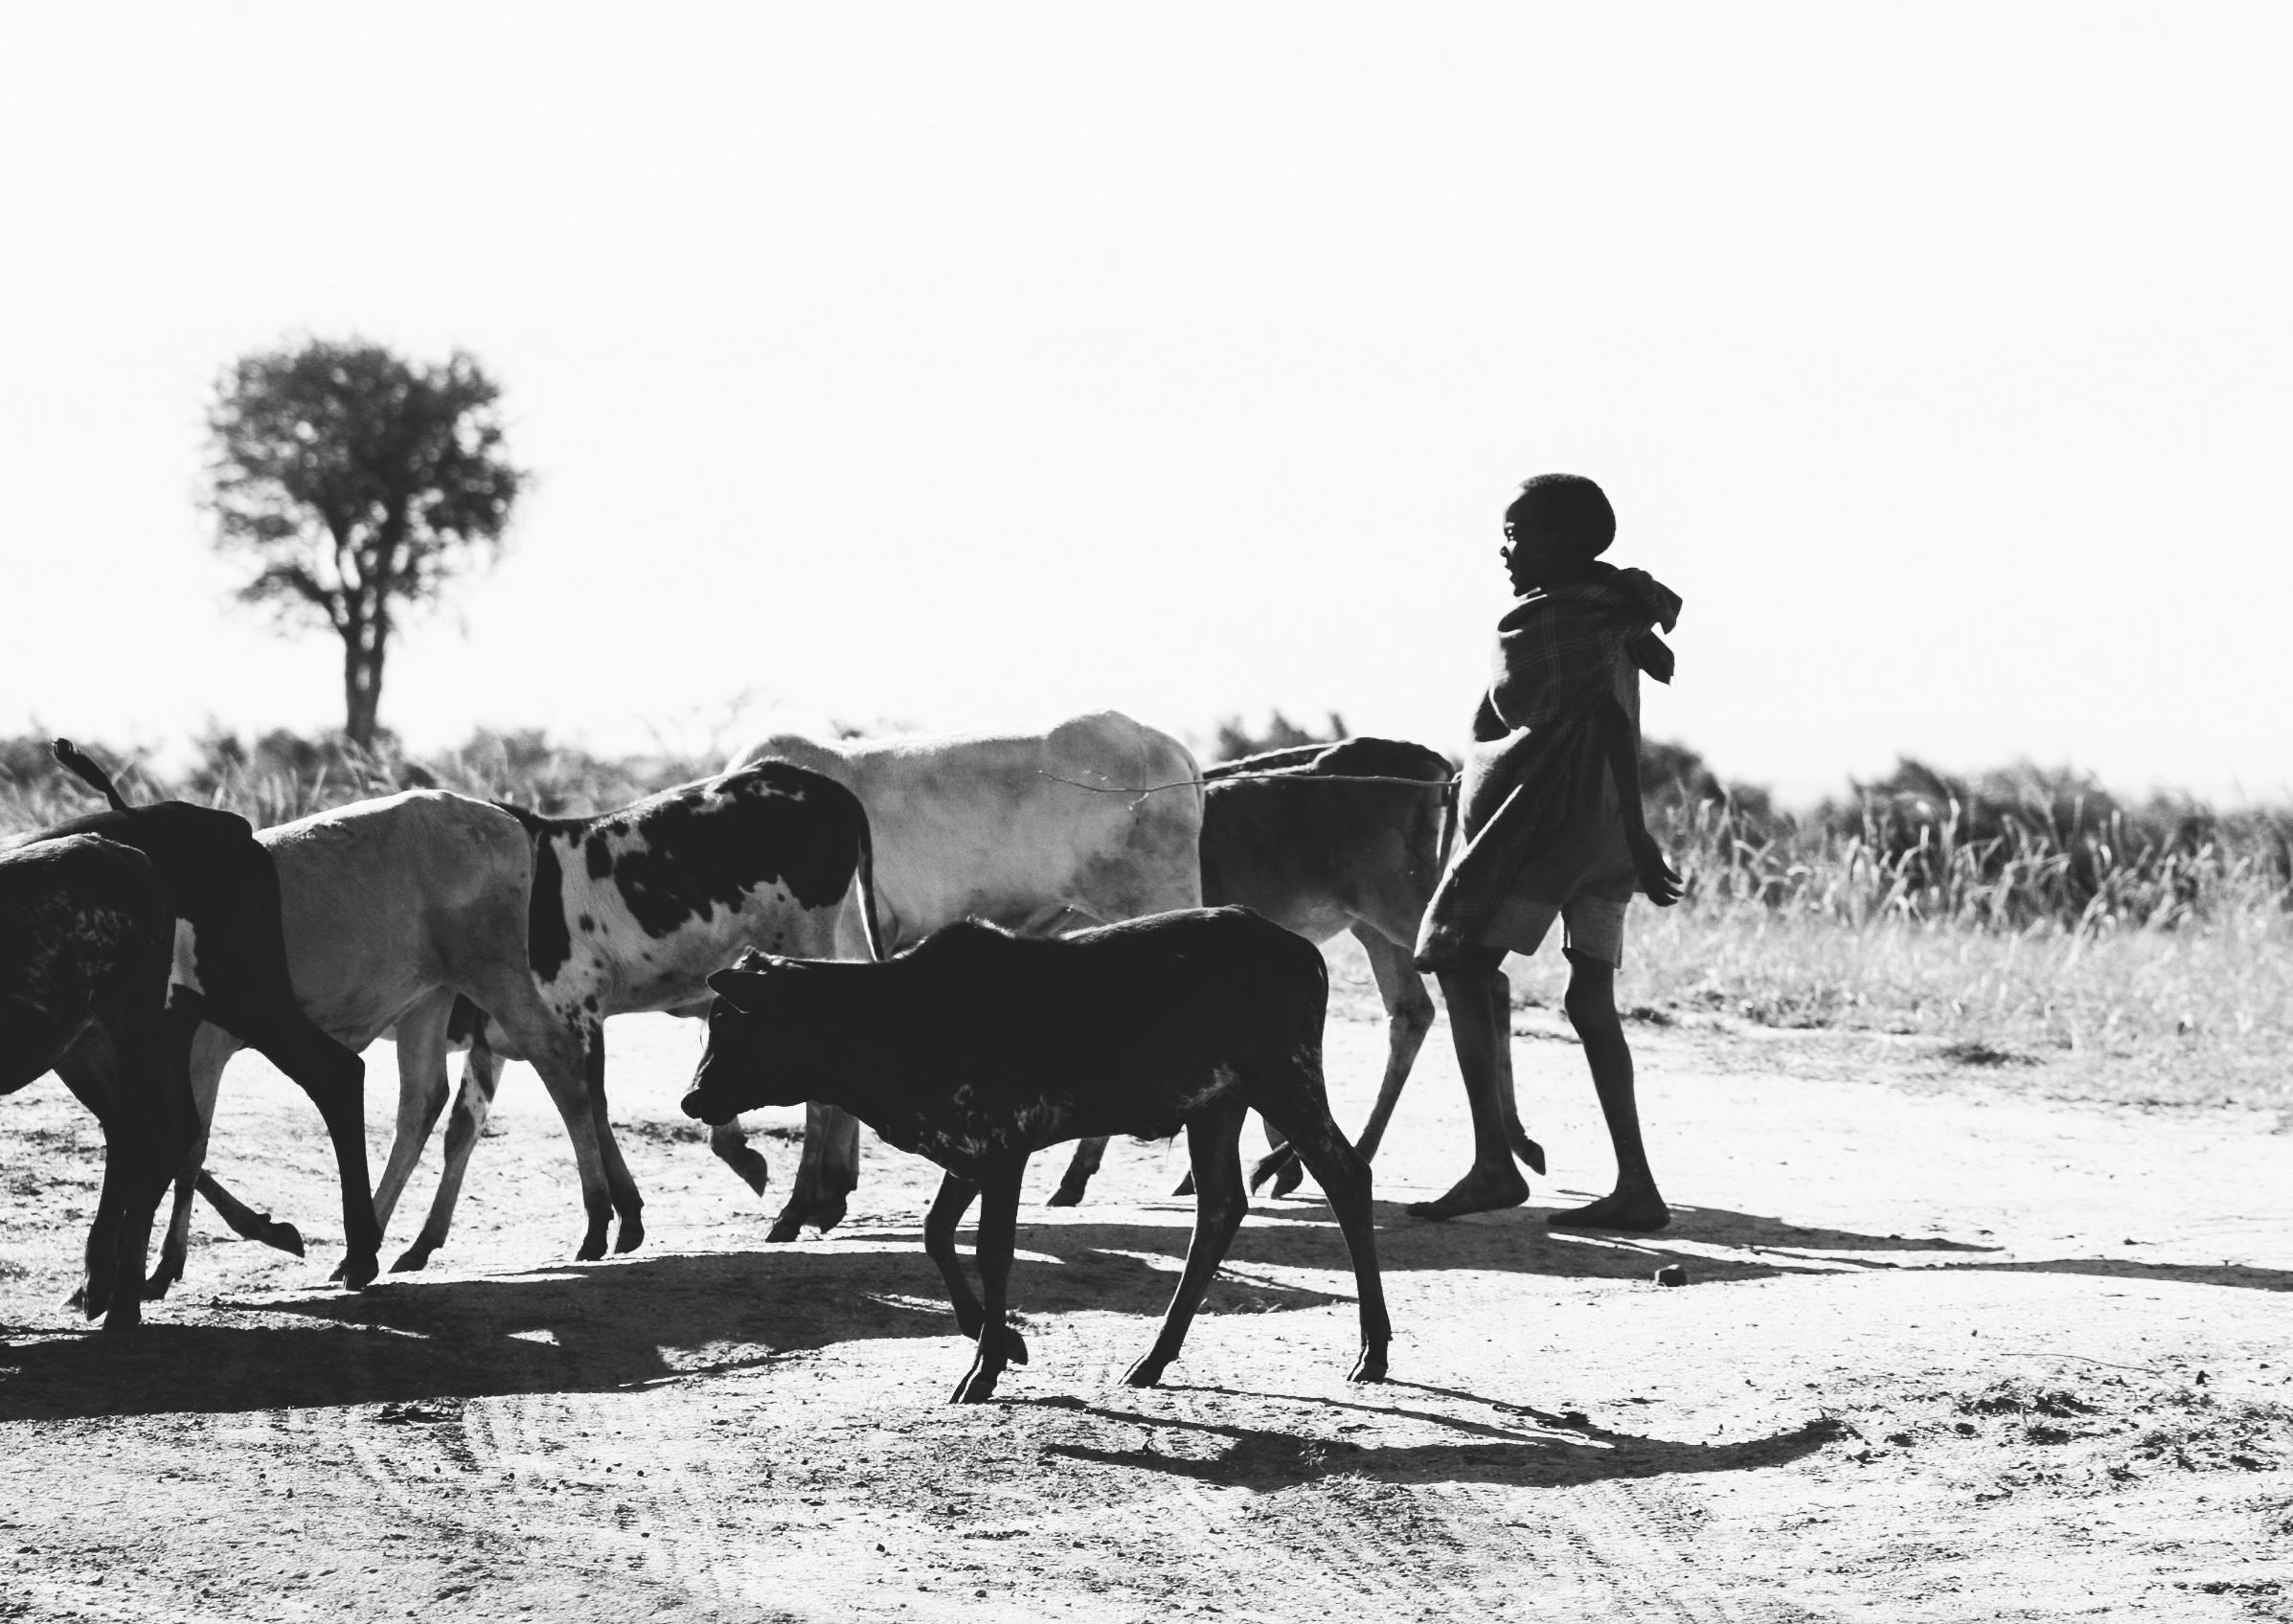 Africa 1176cropped.jpg